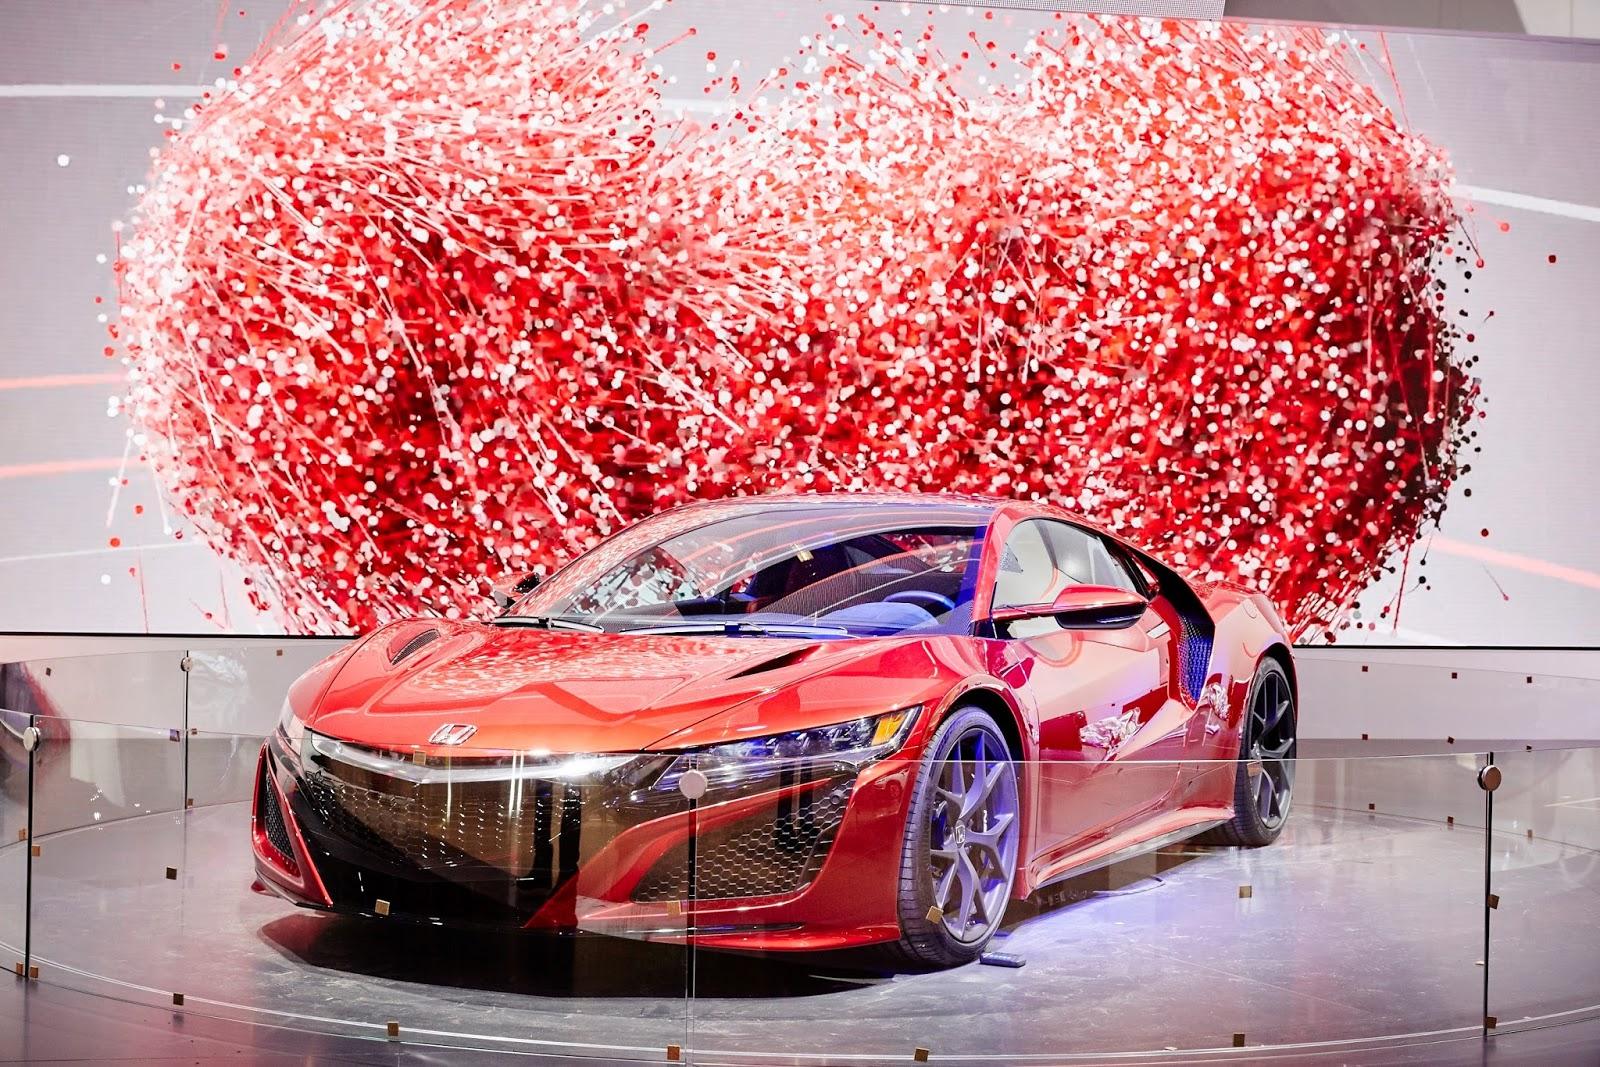 61186 Honda NSX at Frankfurt Motor Show 2015 Η Honda θα παρουσιάσει το S660, ενα λιλιπούτειο διθέσιο roadster με 63 άλογα από μολις 658 κ.εκ